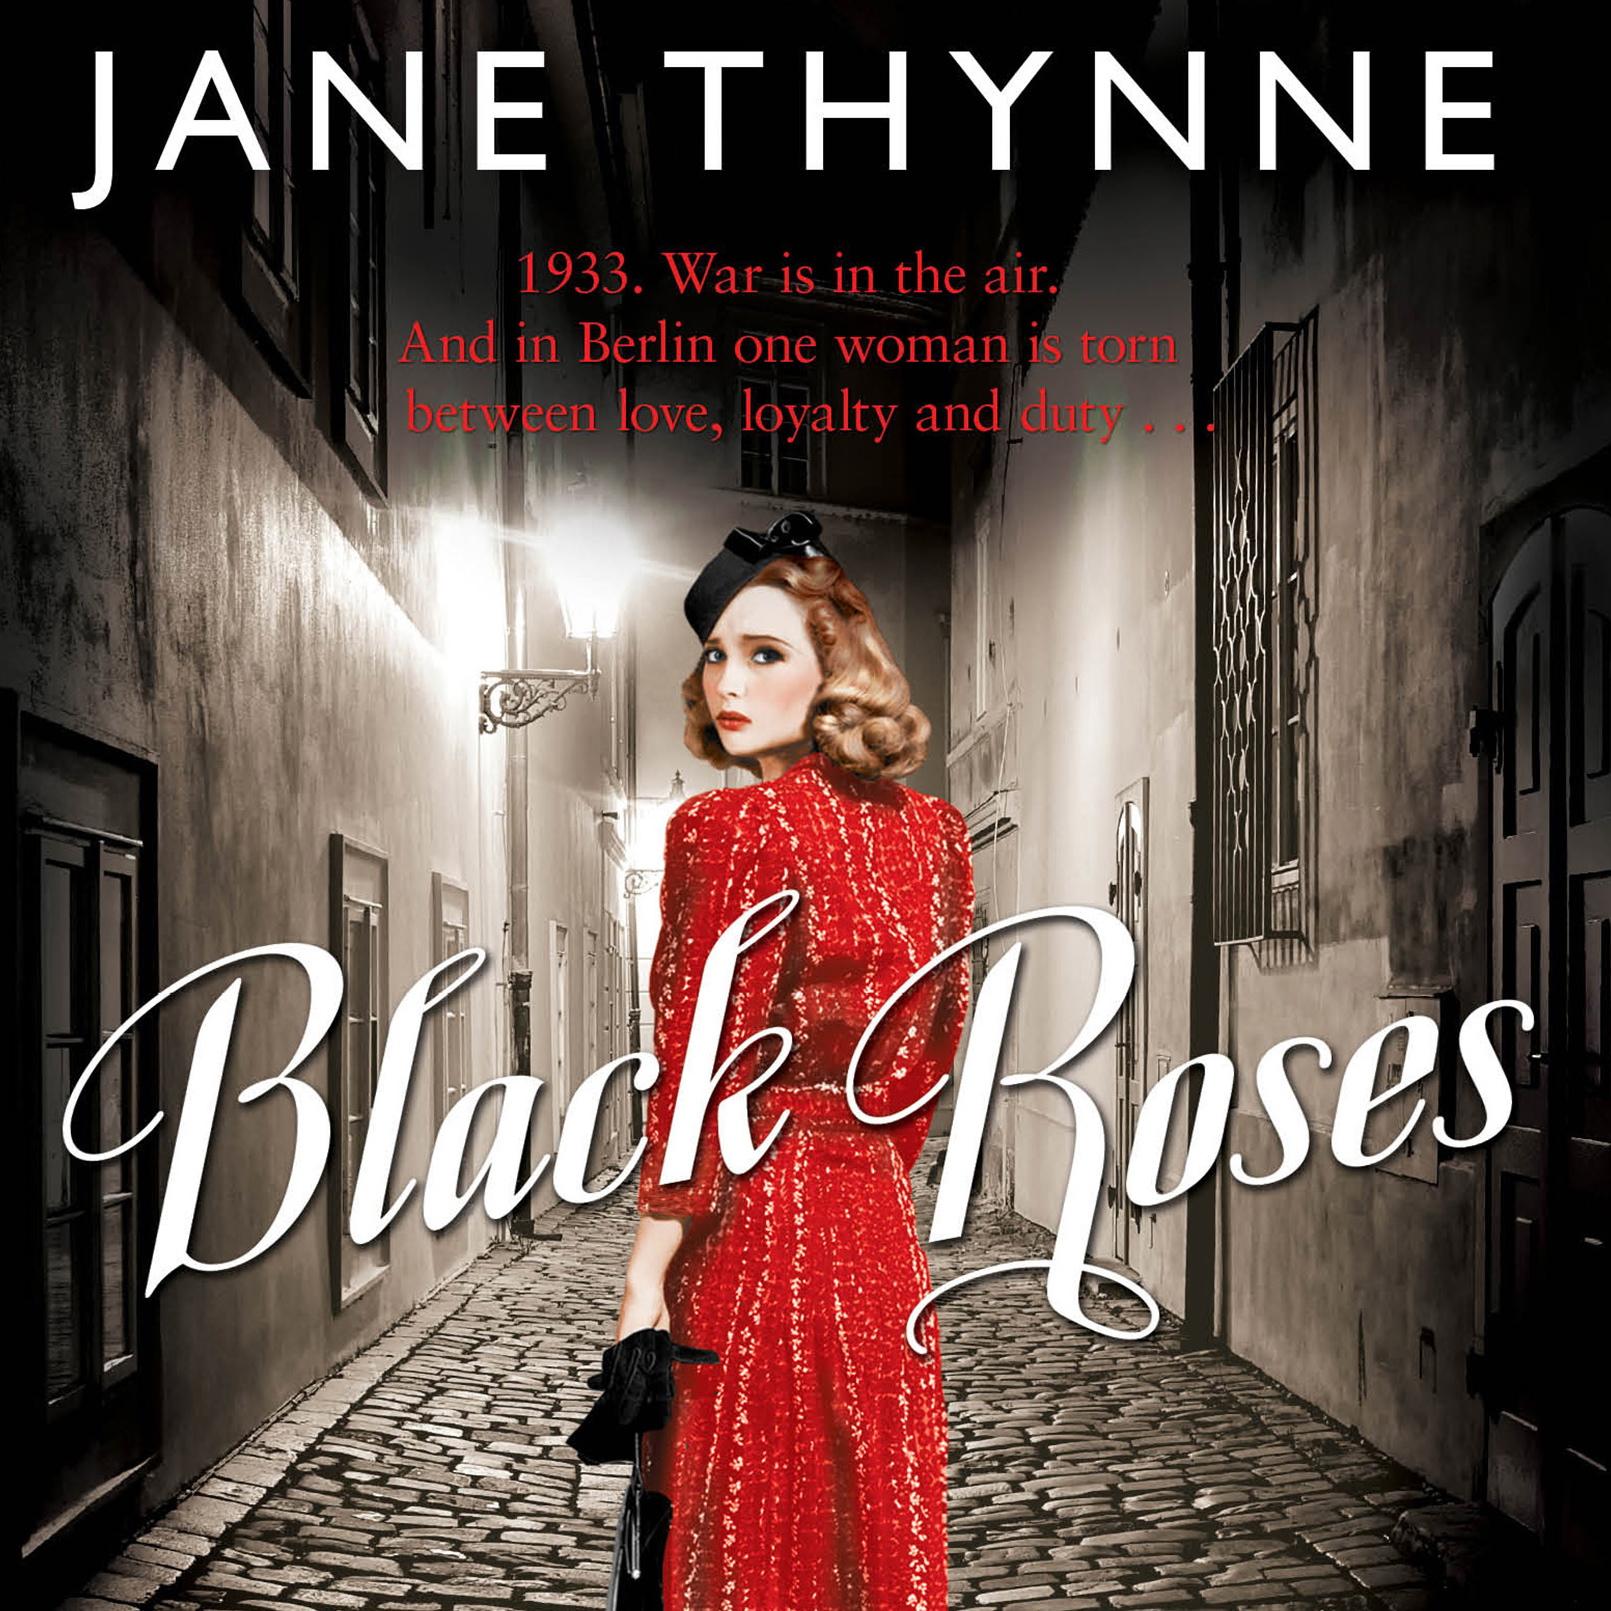 Black Roses Blog Tour: the Q&A